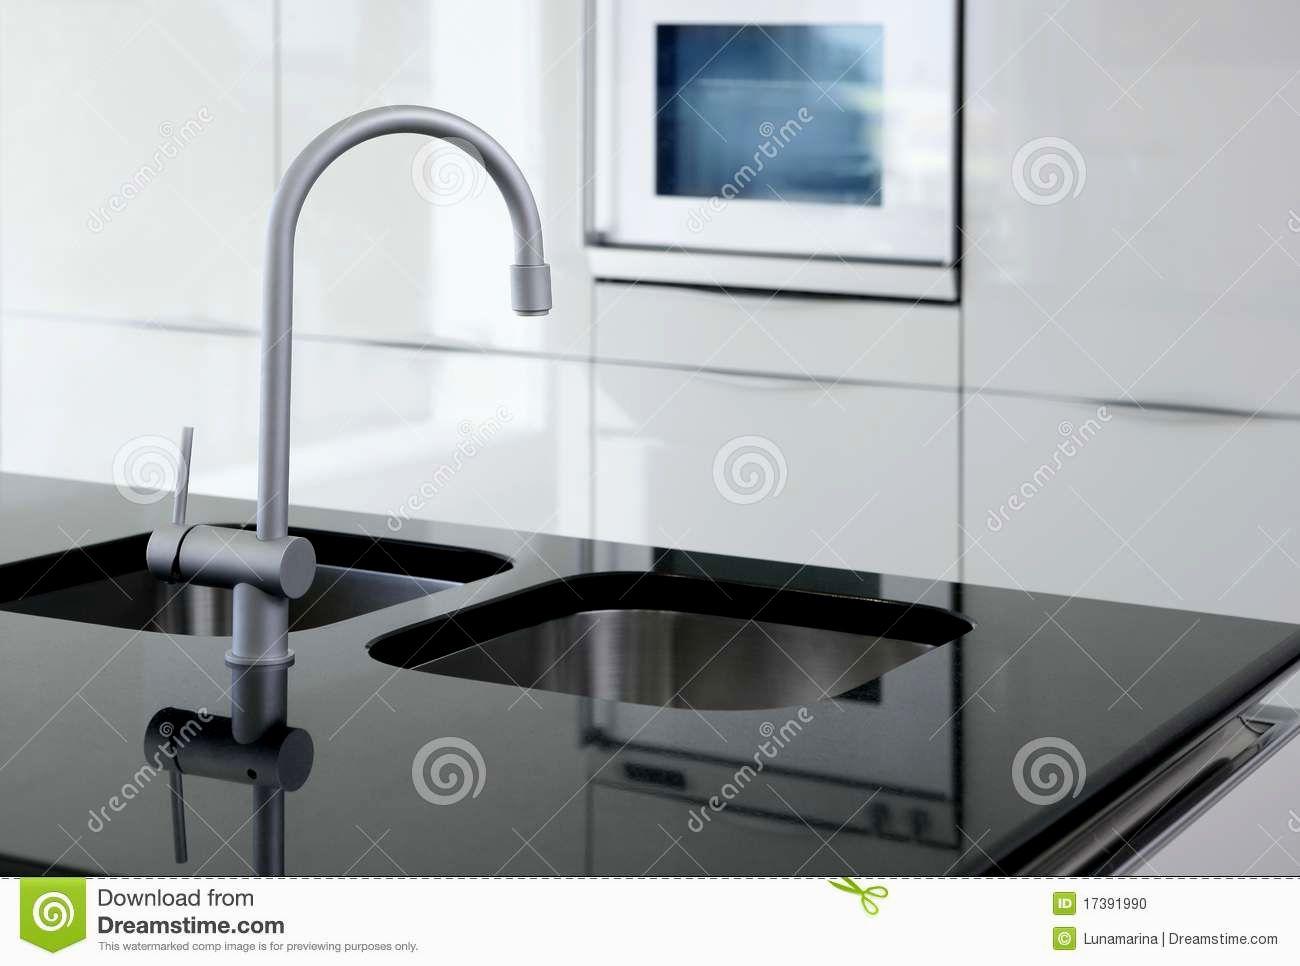 elegant faucet bathroom sink concept-Inspirational Faucet Bathroom Sink Portrait